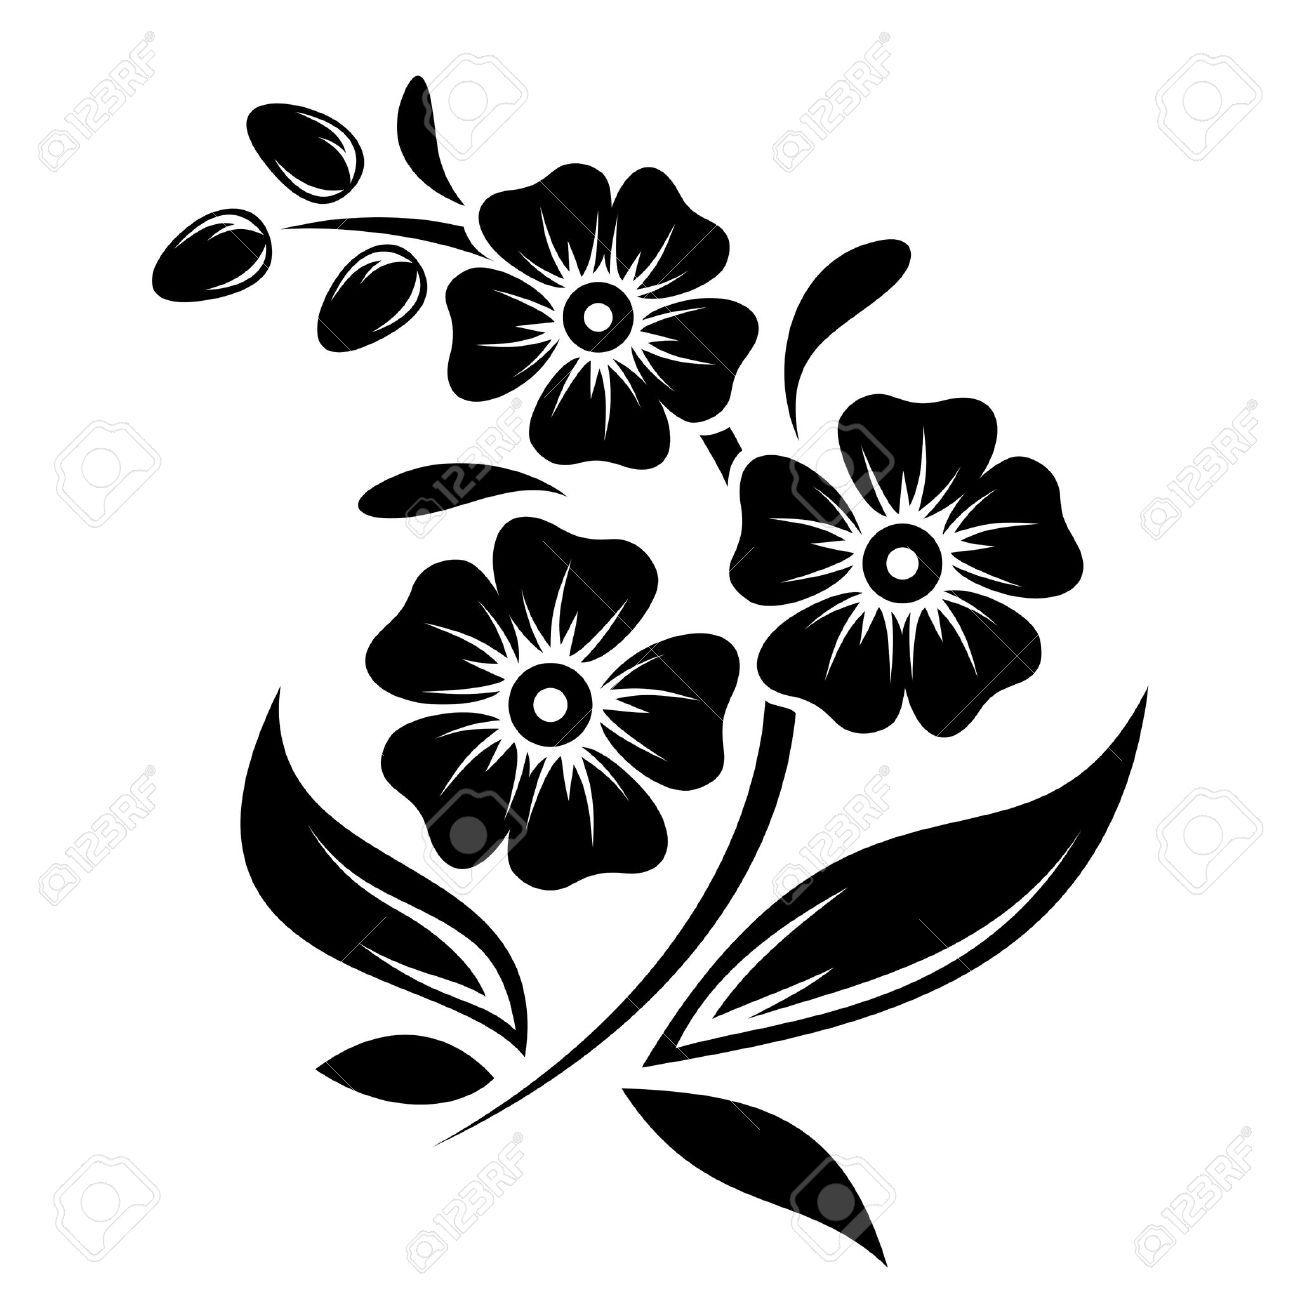 Black Silhouette Of Flowers Vector Illustration Royalty